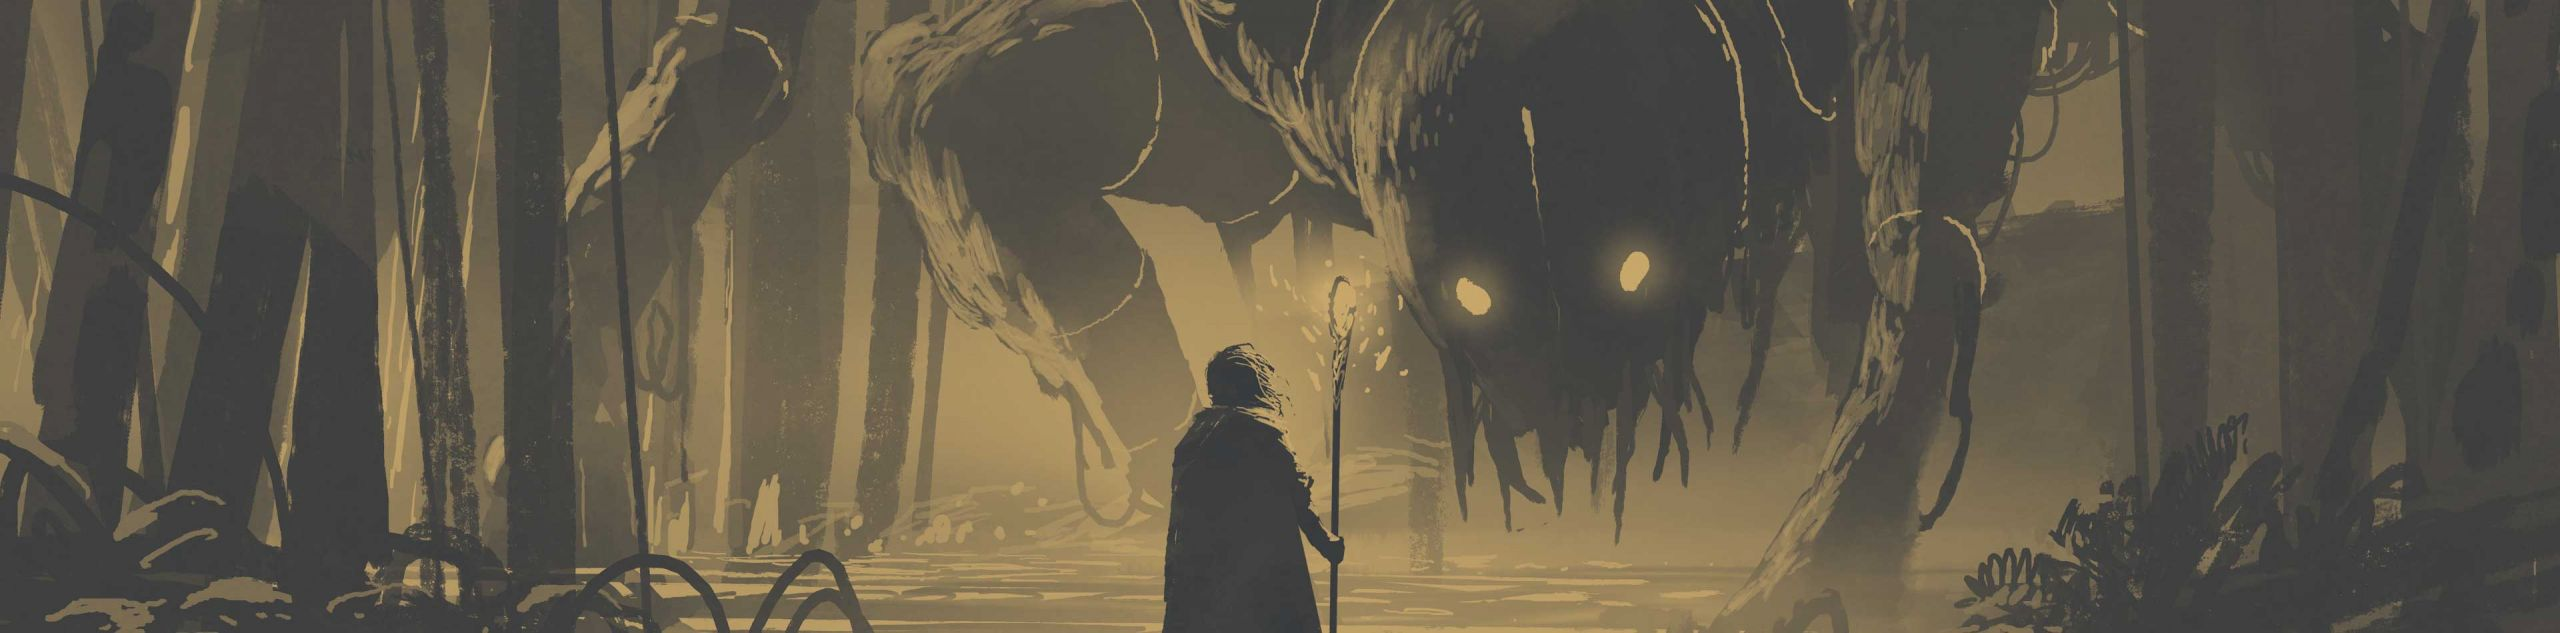 monsterjagd high fantasy setting